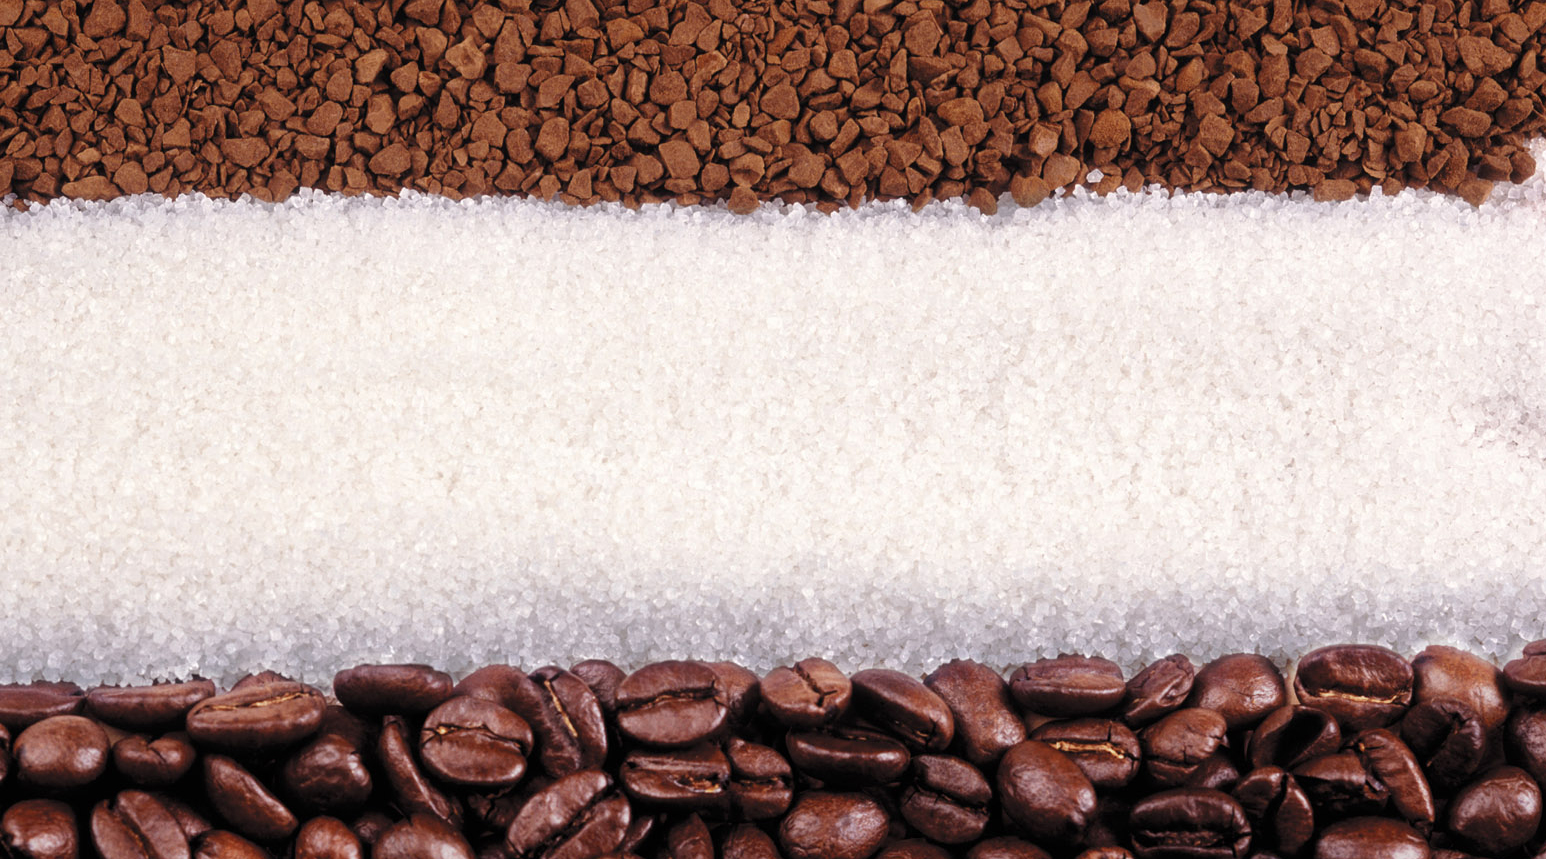 Gula dan kopi hilangkan keriput di kaki